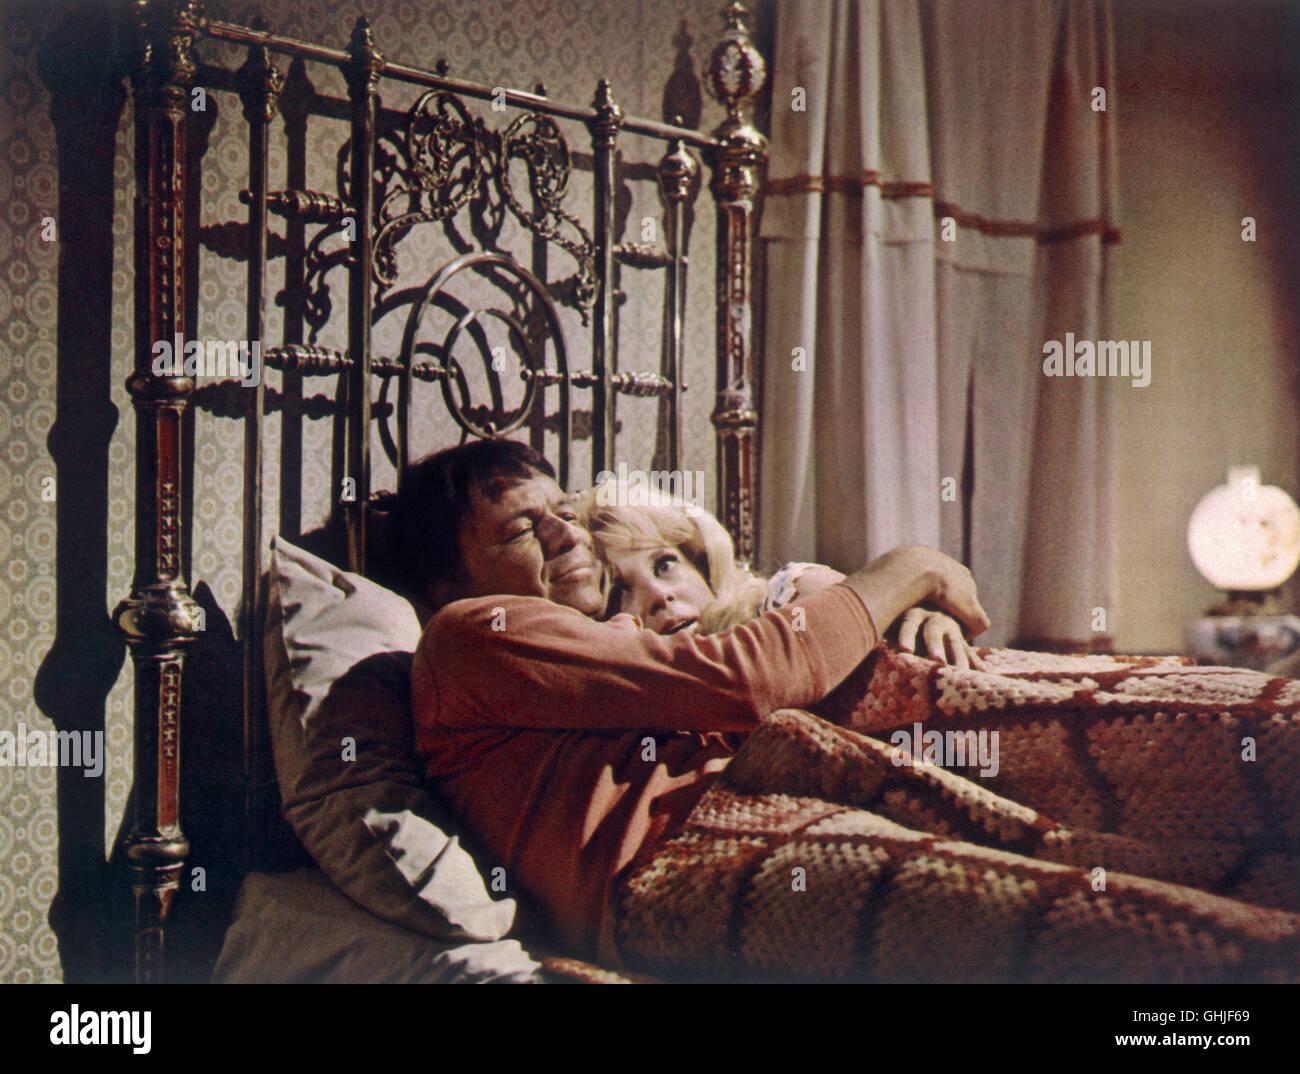 FRANK SINATRA, LOIS NETTLETON Regie: Burt Kennedy aka. Dirty Dingus Magee - Stock Image